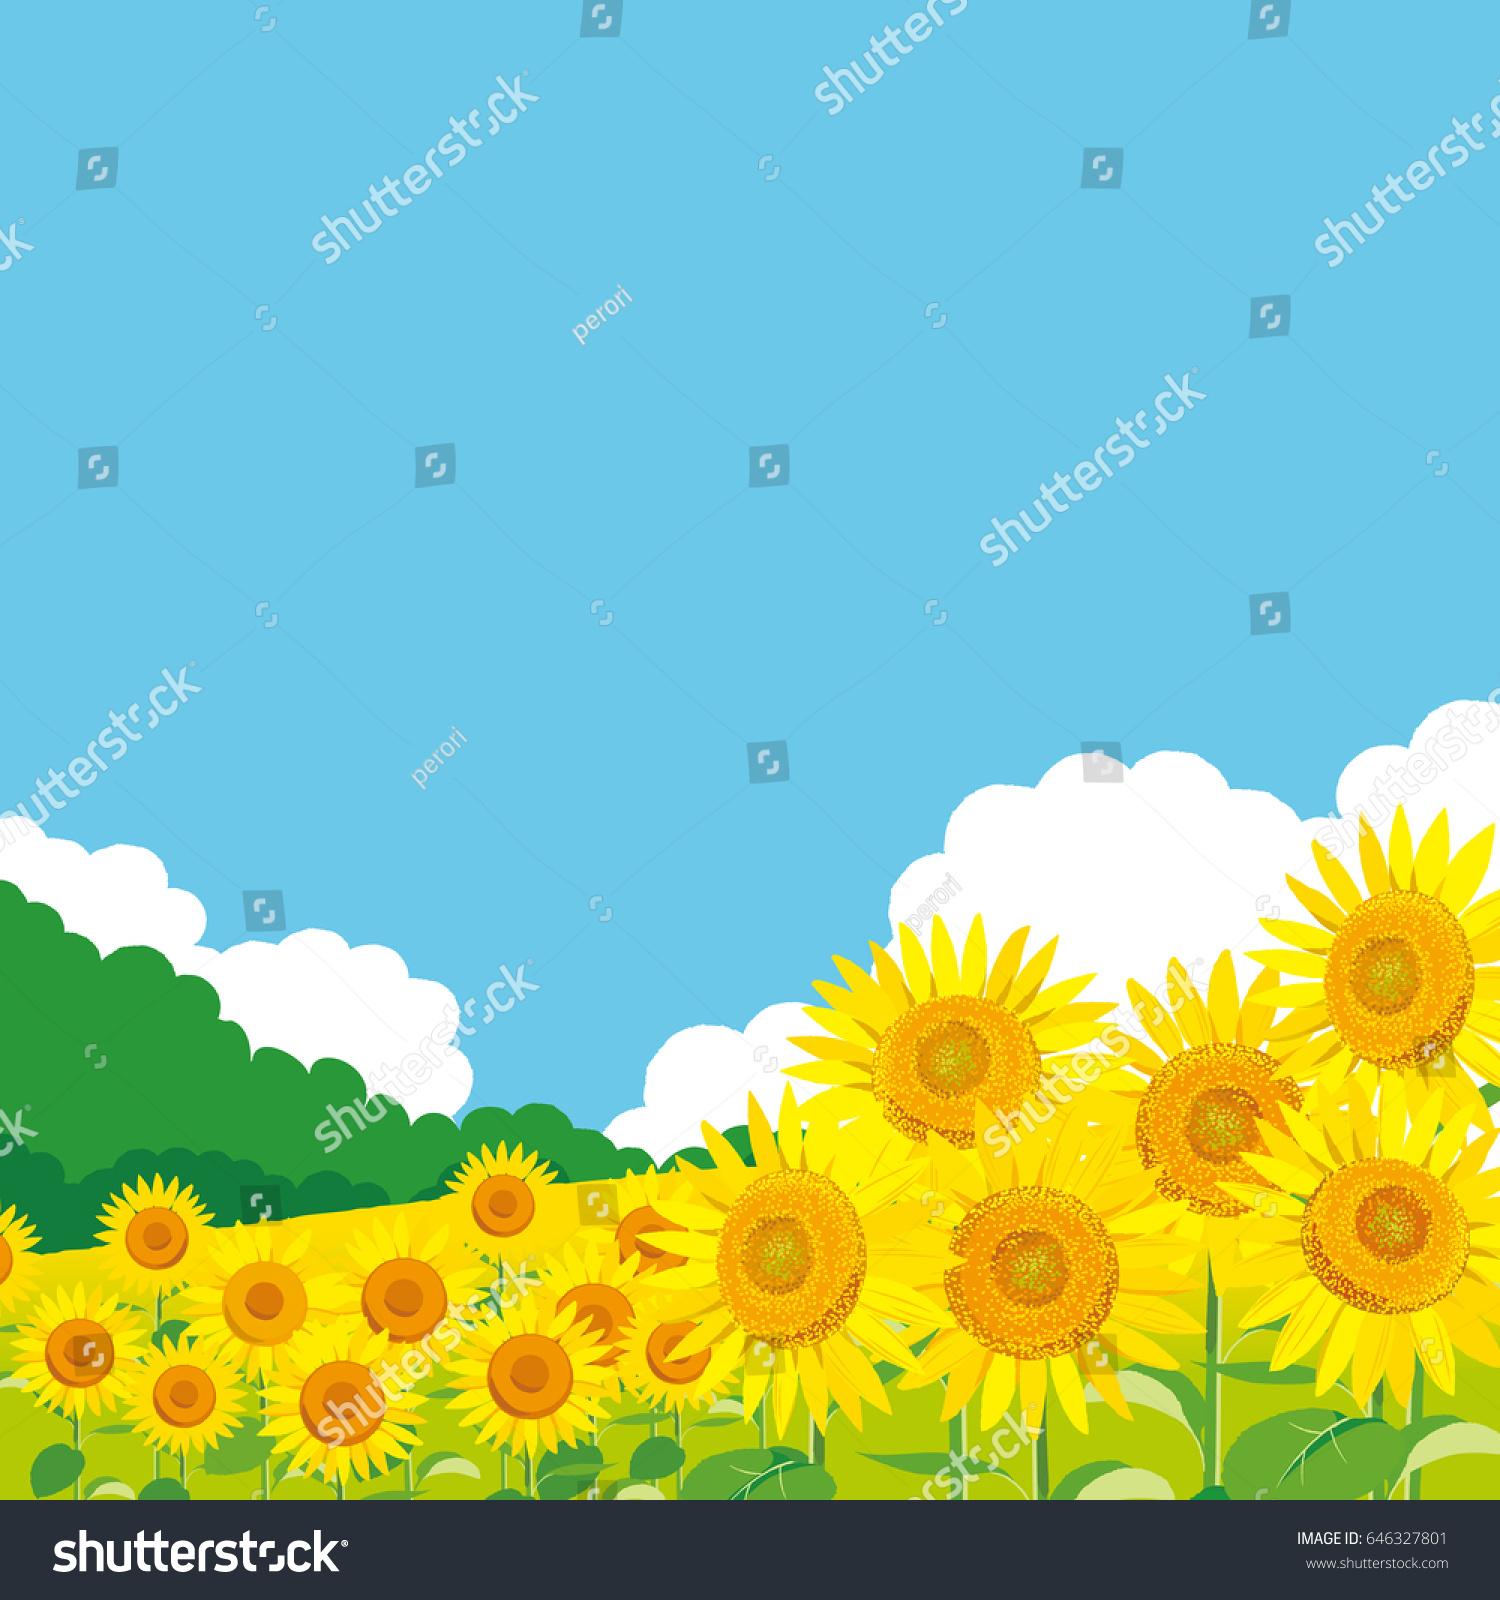 vector illustration wallpaper background landscape sunflowers stock